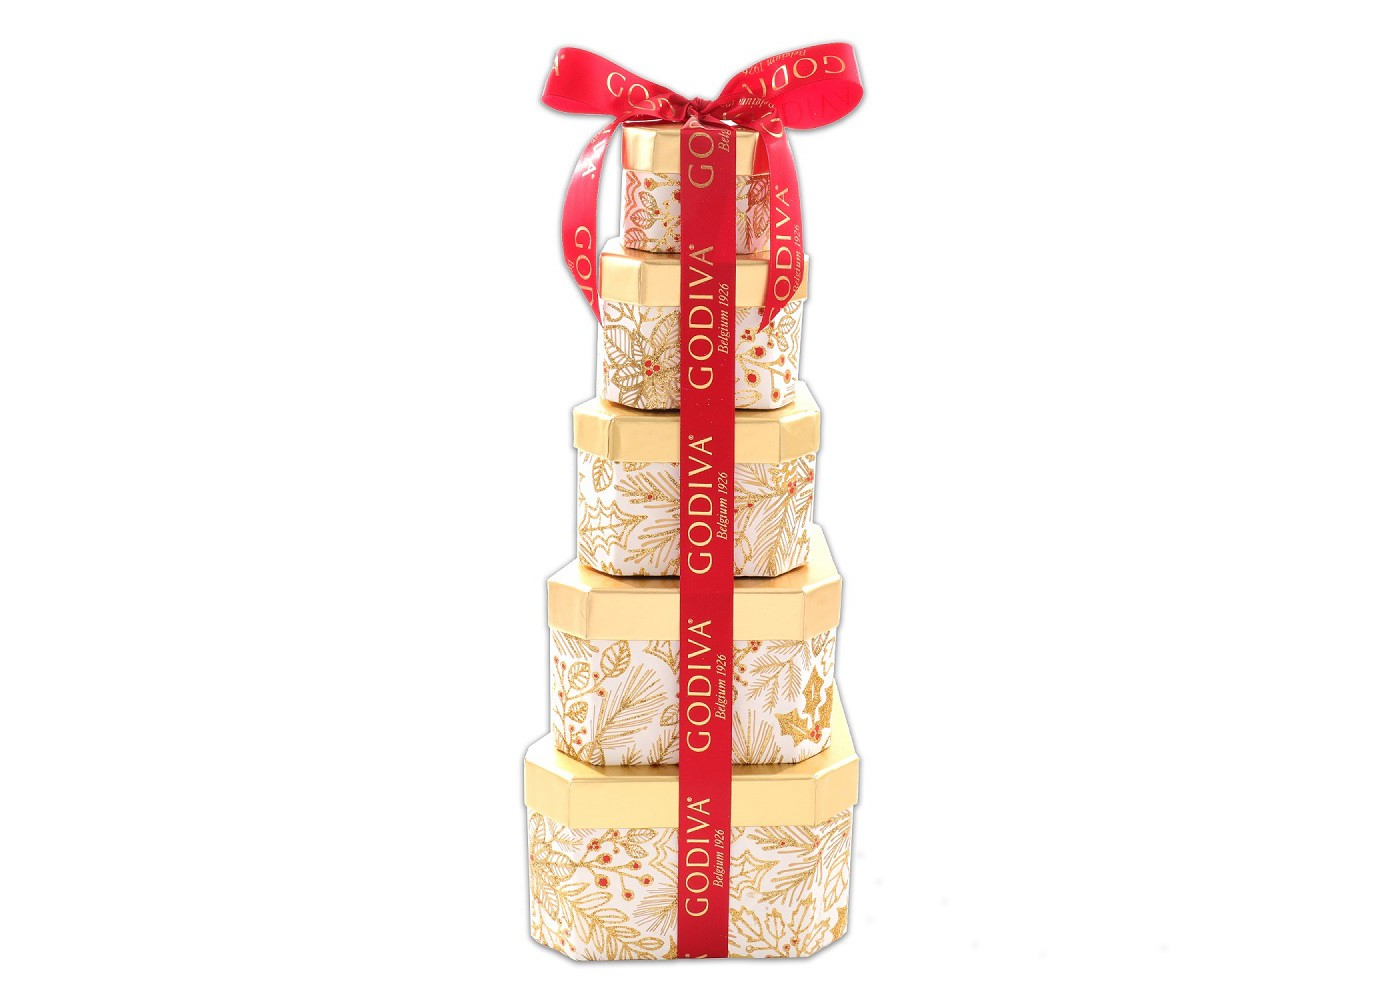 Alder Creek Gifts Godiva Christmas Tower Gift Basket - 3lb - image 1 of 1